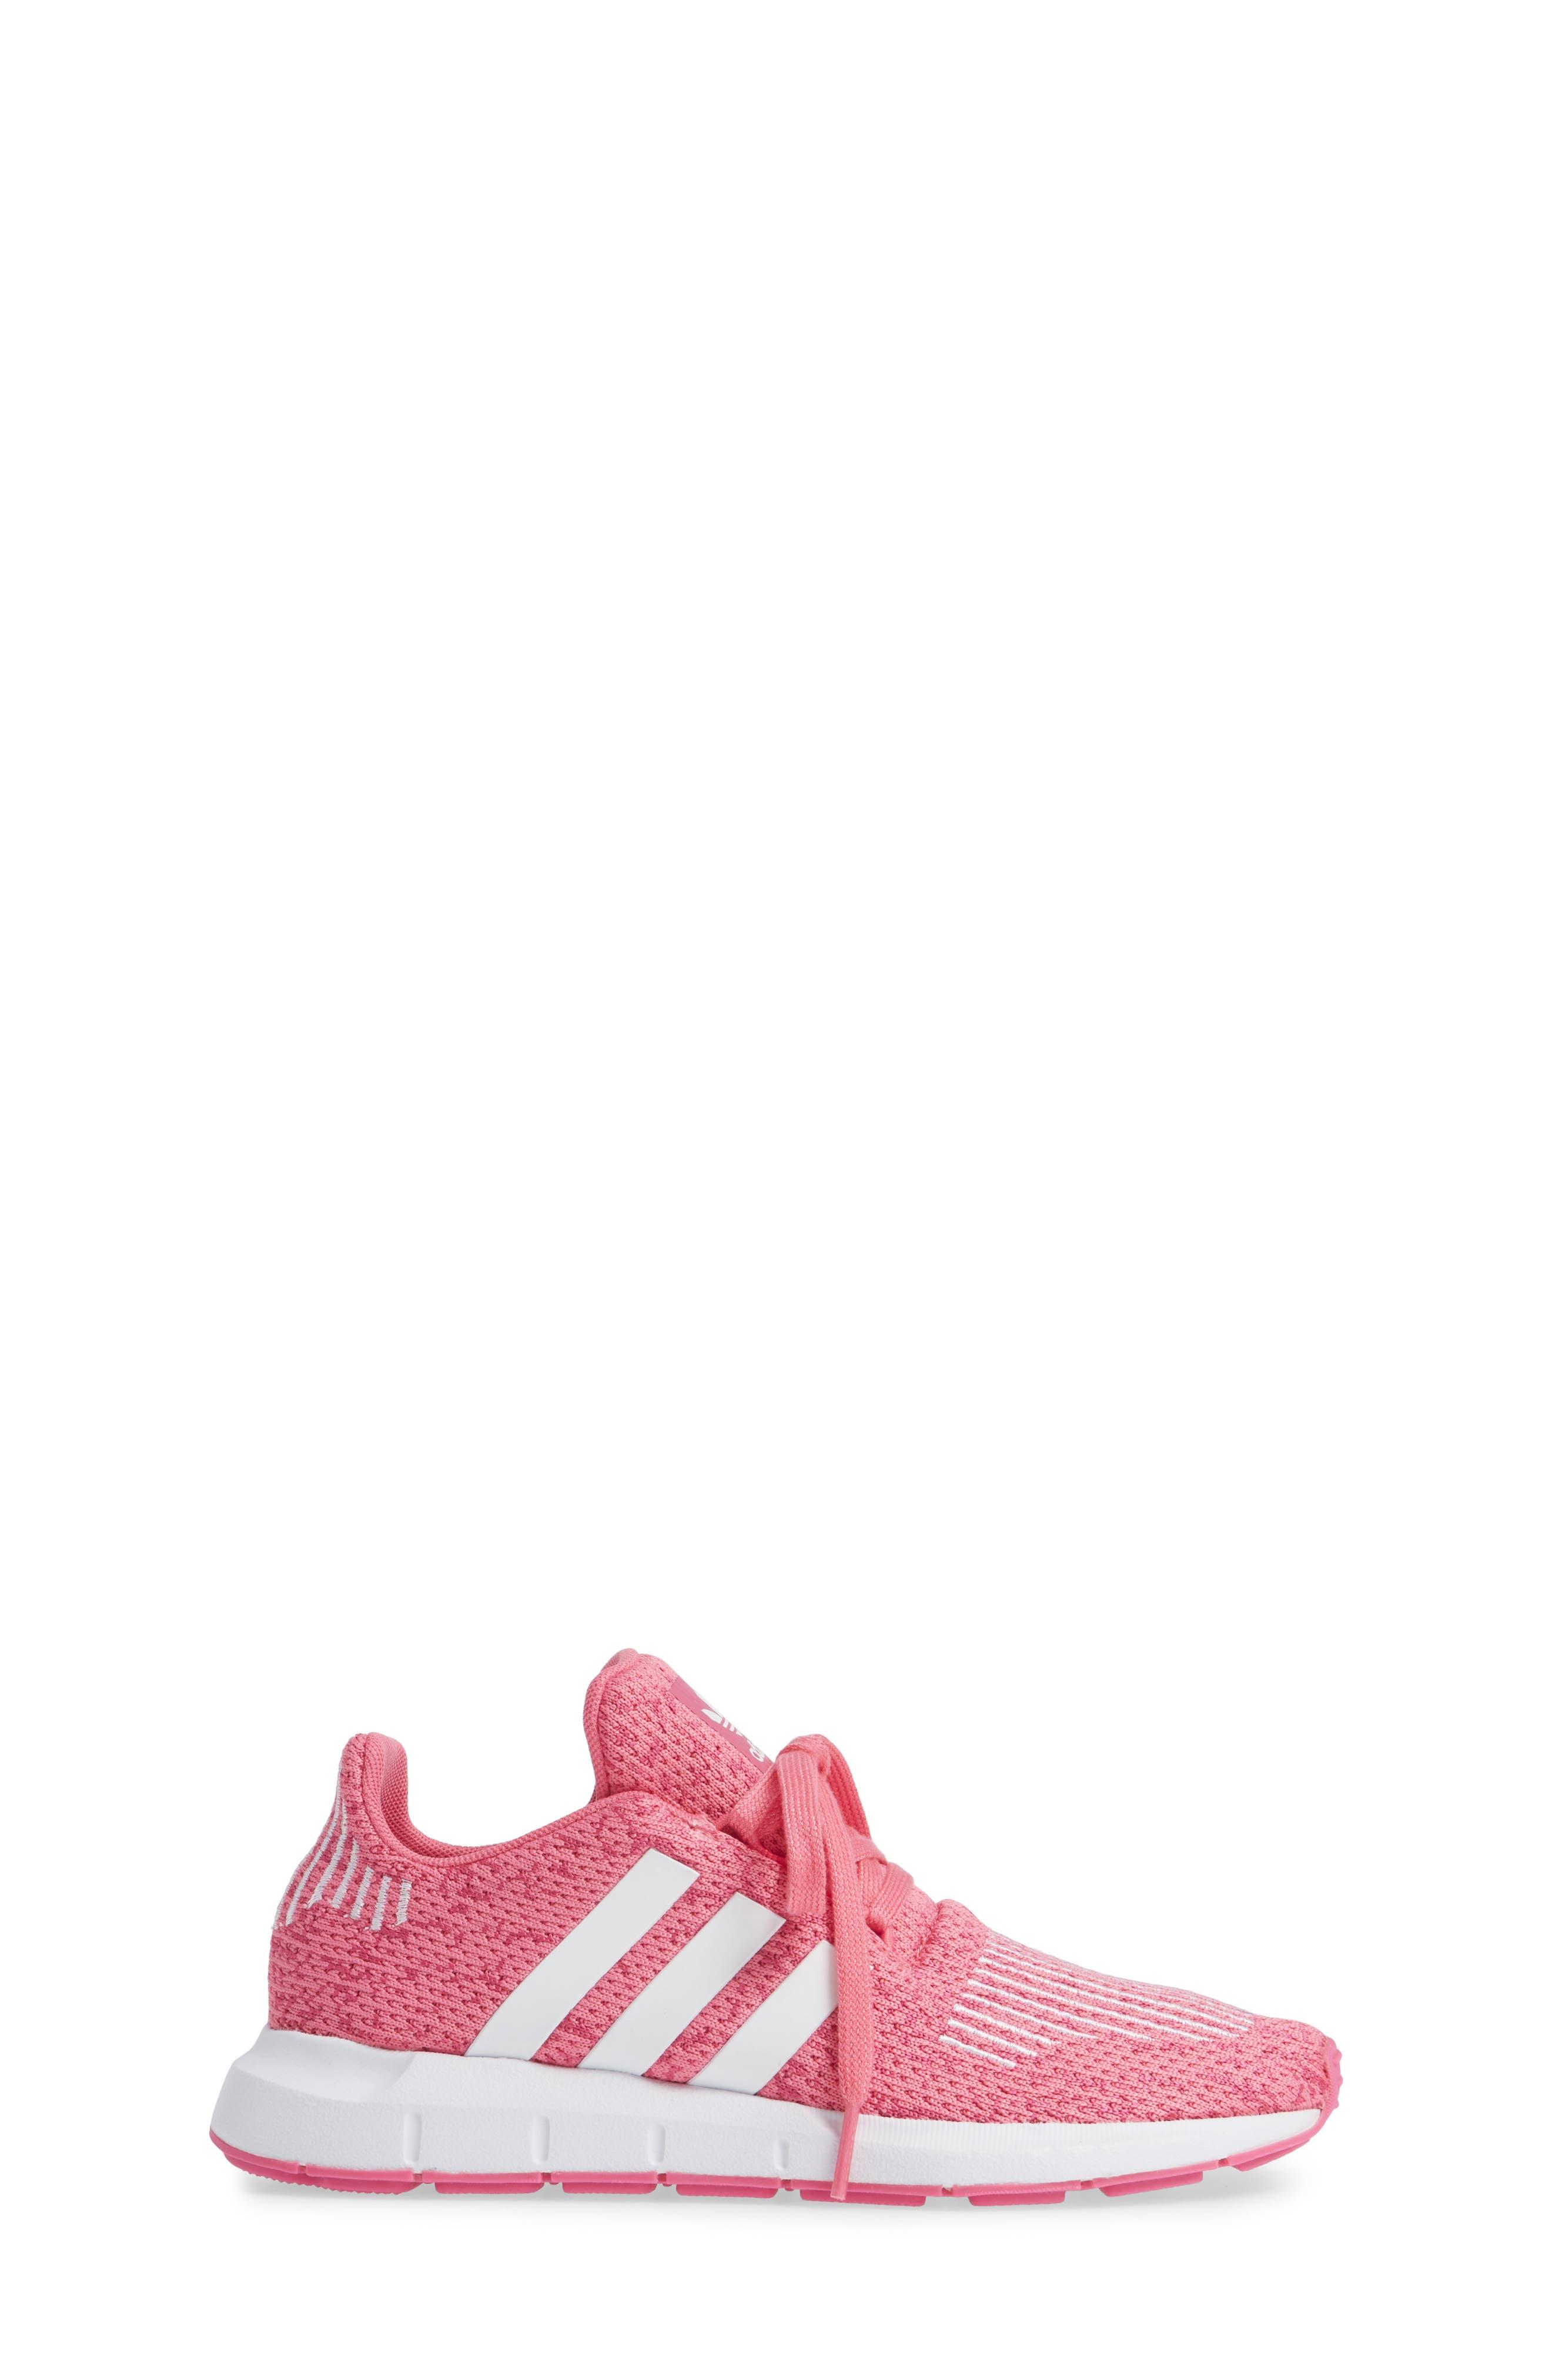 Swift Run J Sneaker,                             Alternate thumbnail 3, color,                             SEMI SOLAR PINK/ WHITE